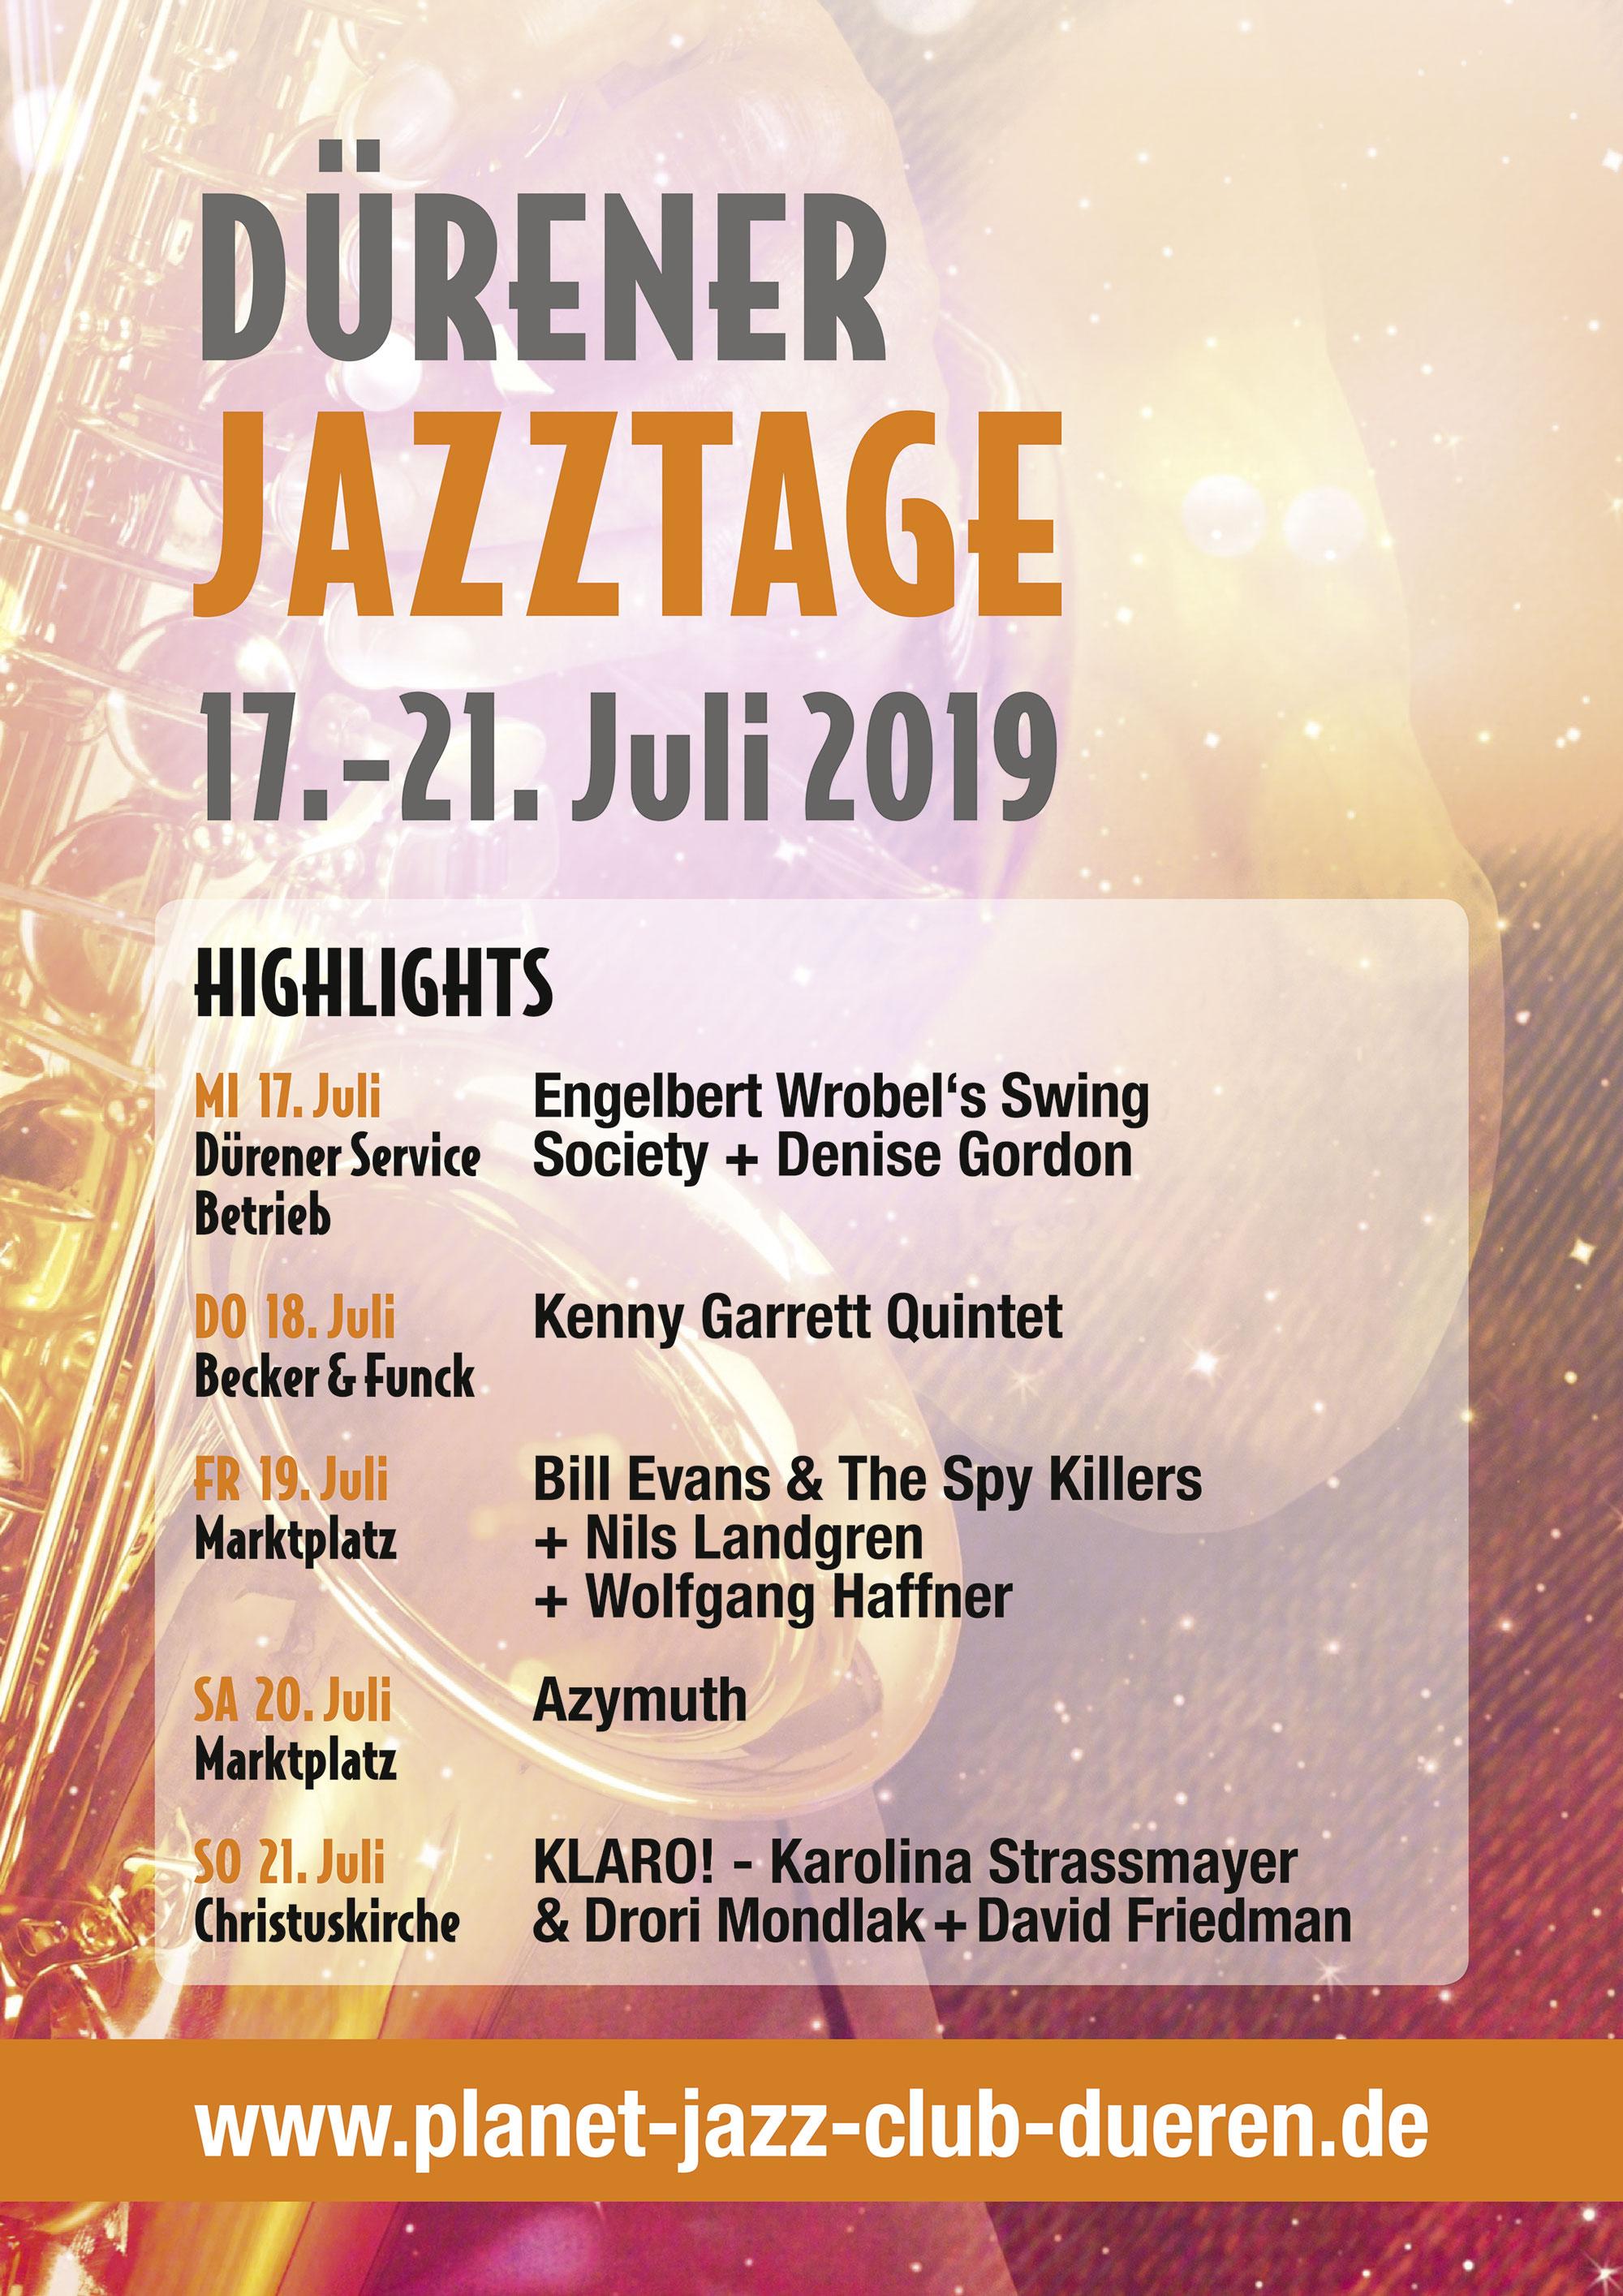 duerener-jazztage-2019-plakat-dsb